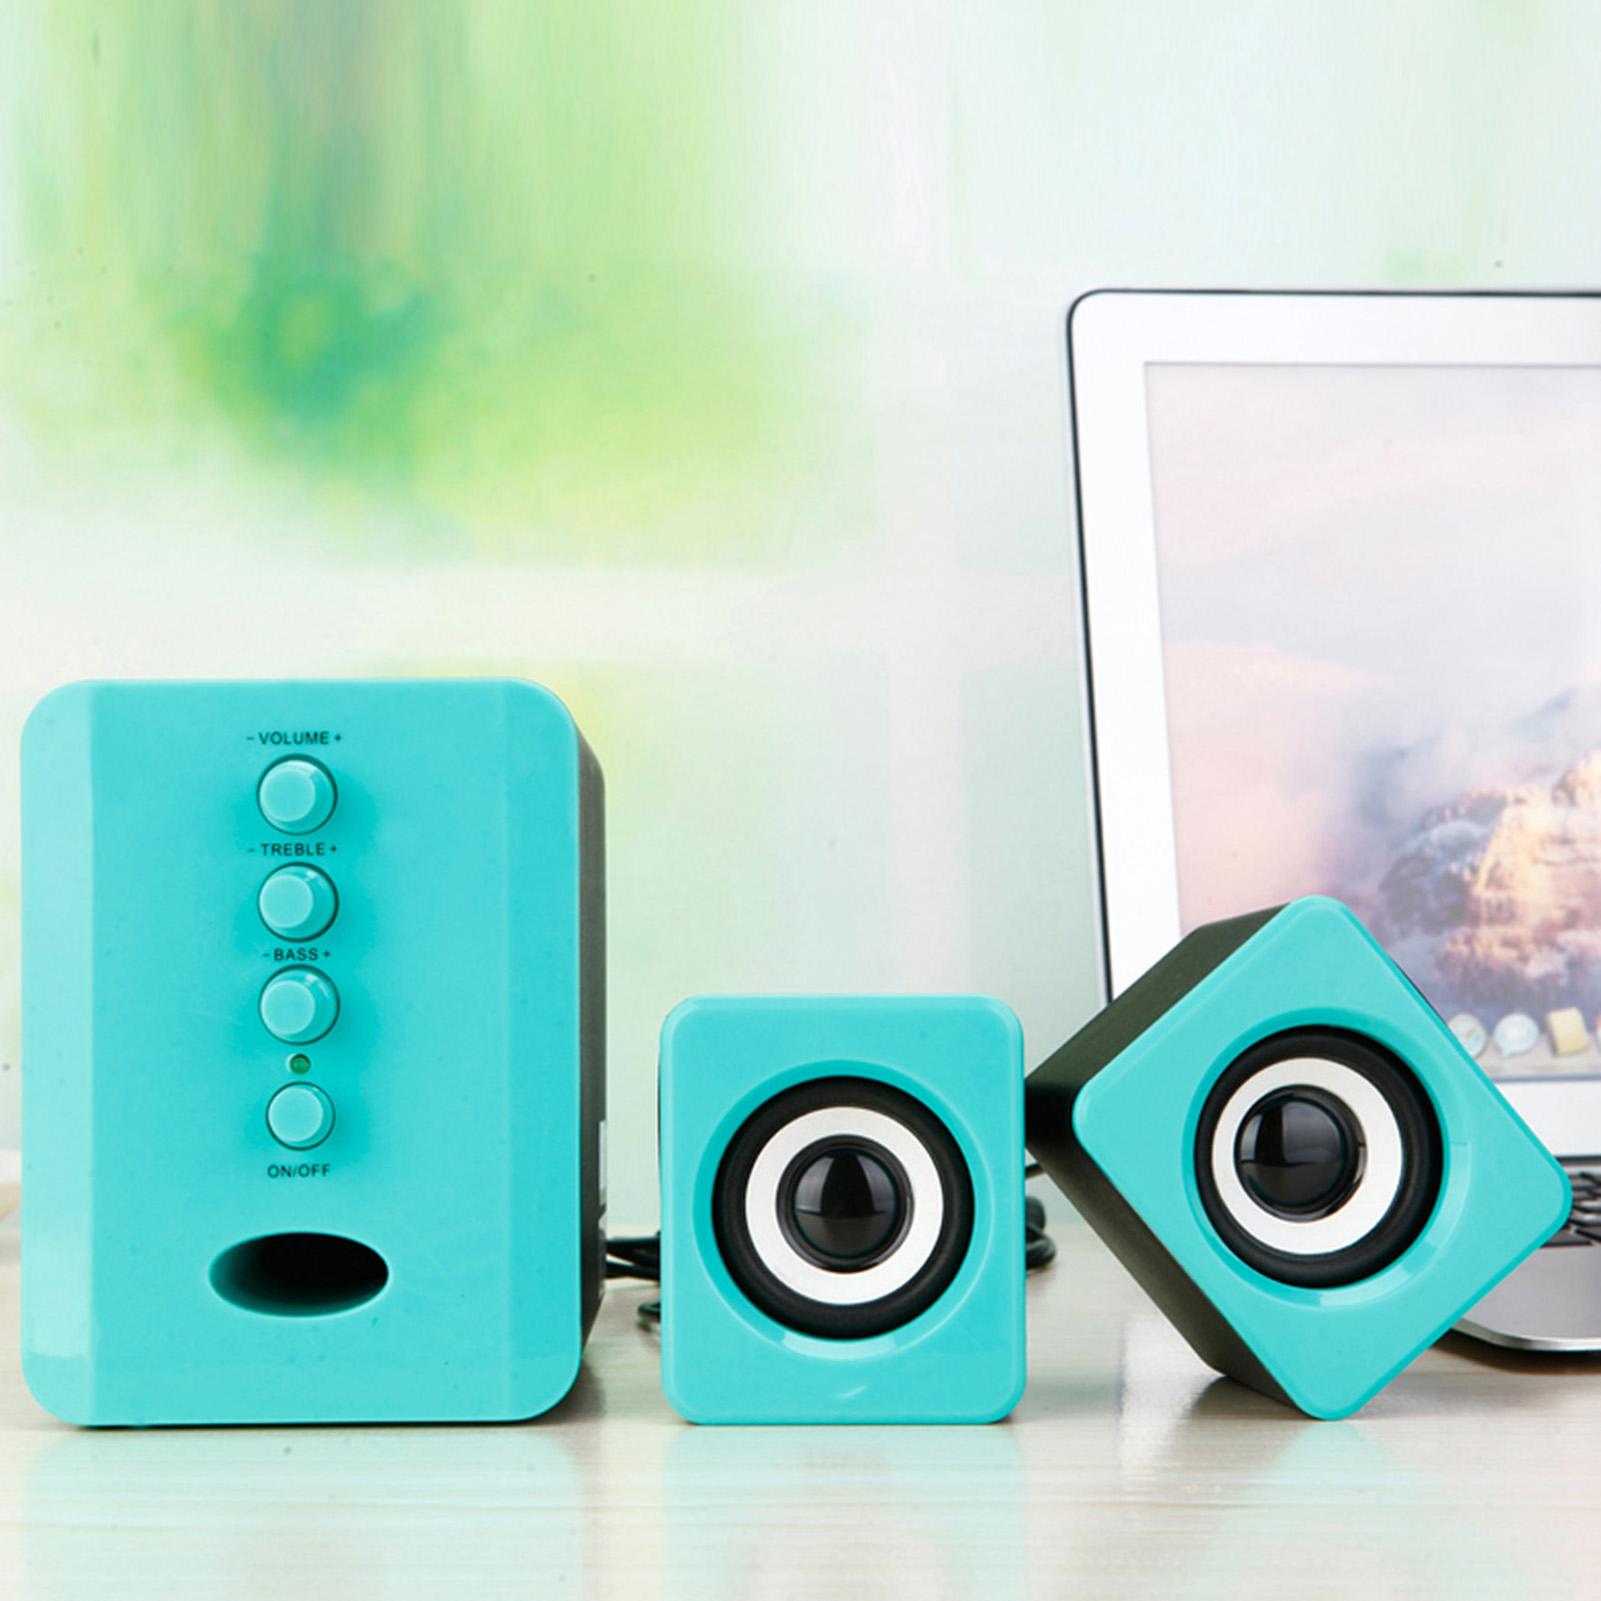 SADA-Bluetooth-Computer-Speaker-3-5mm-Desktop-Laptop-PC-Stereo-Bass-Subwoofer-SS thumbnail 82